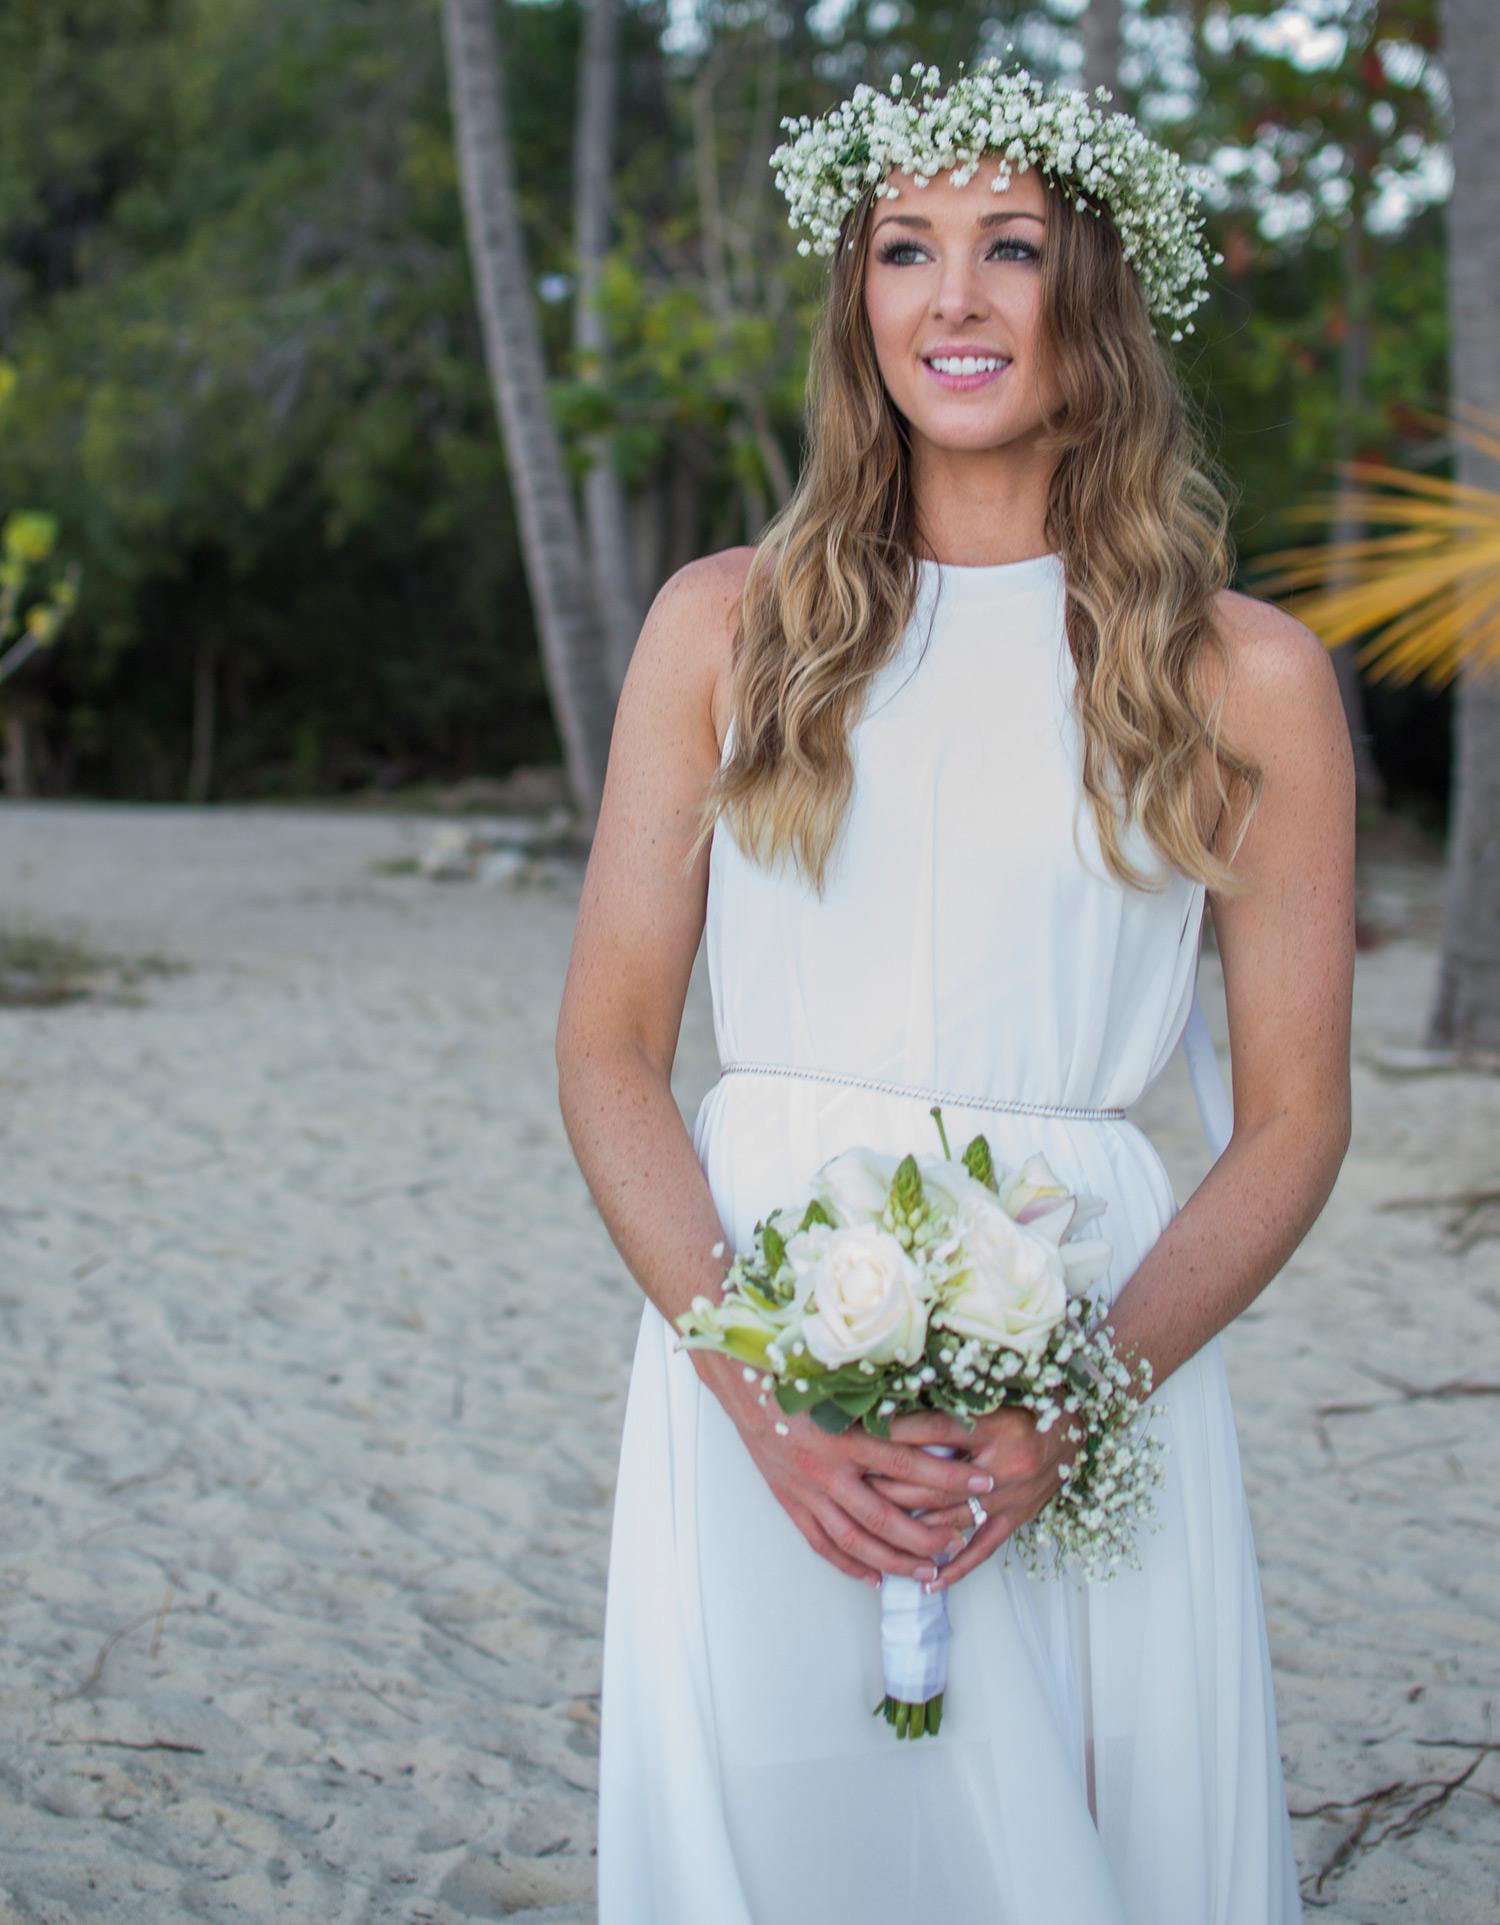 Married at First Sight's Jamie Otis wedding dress